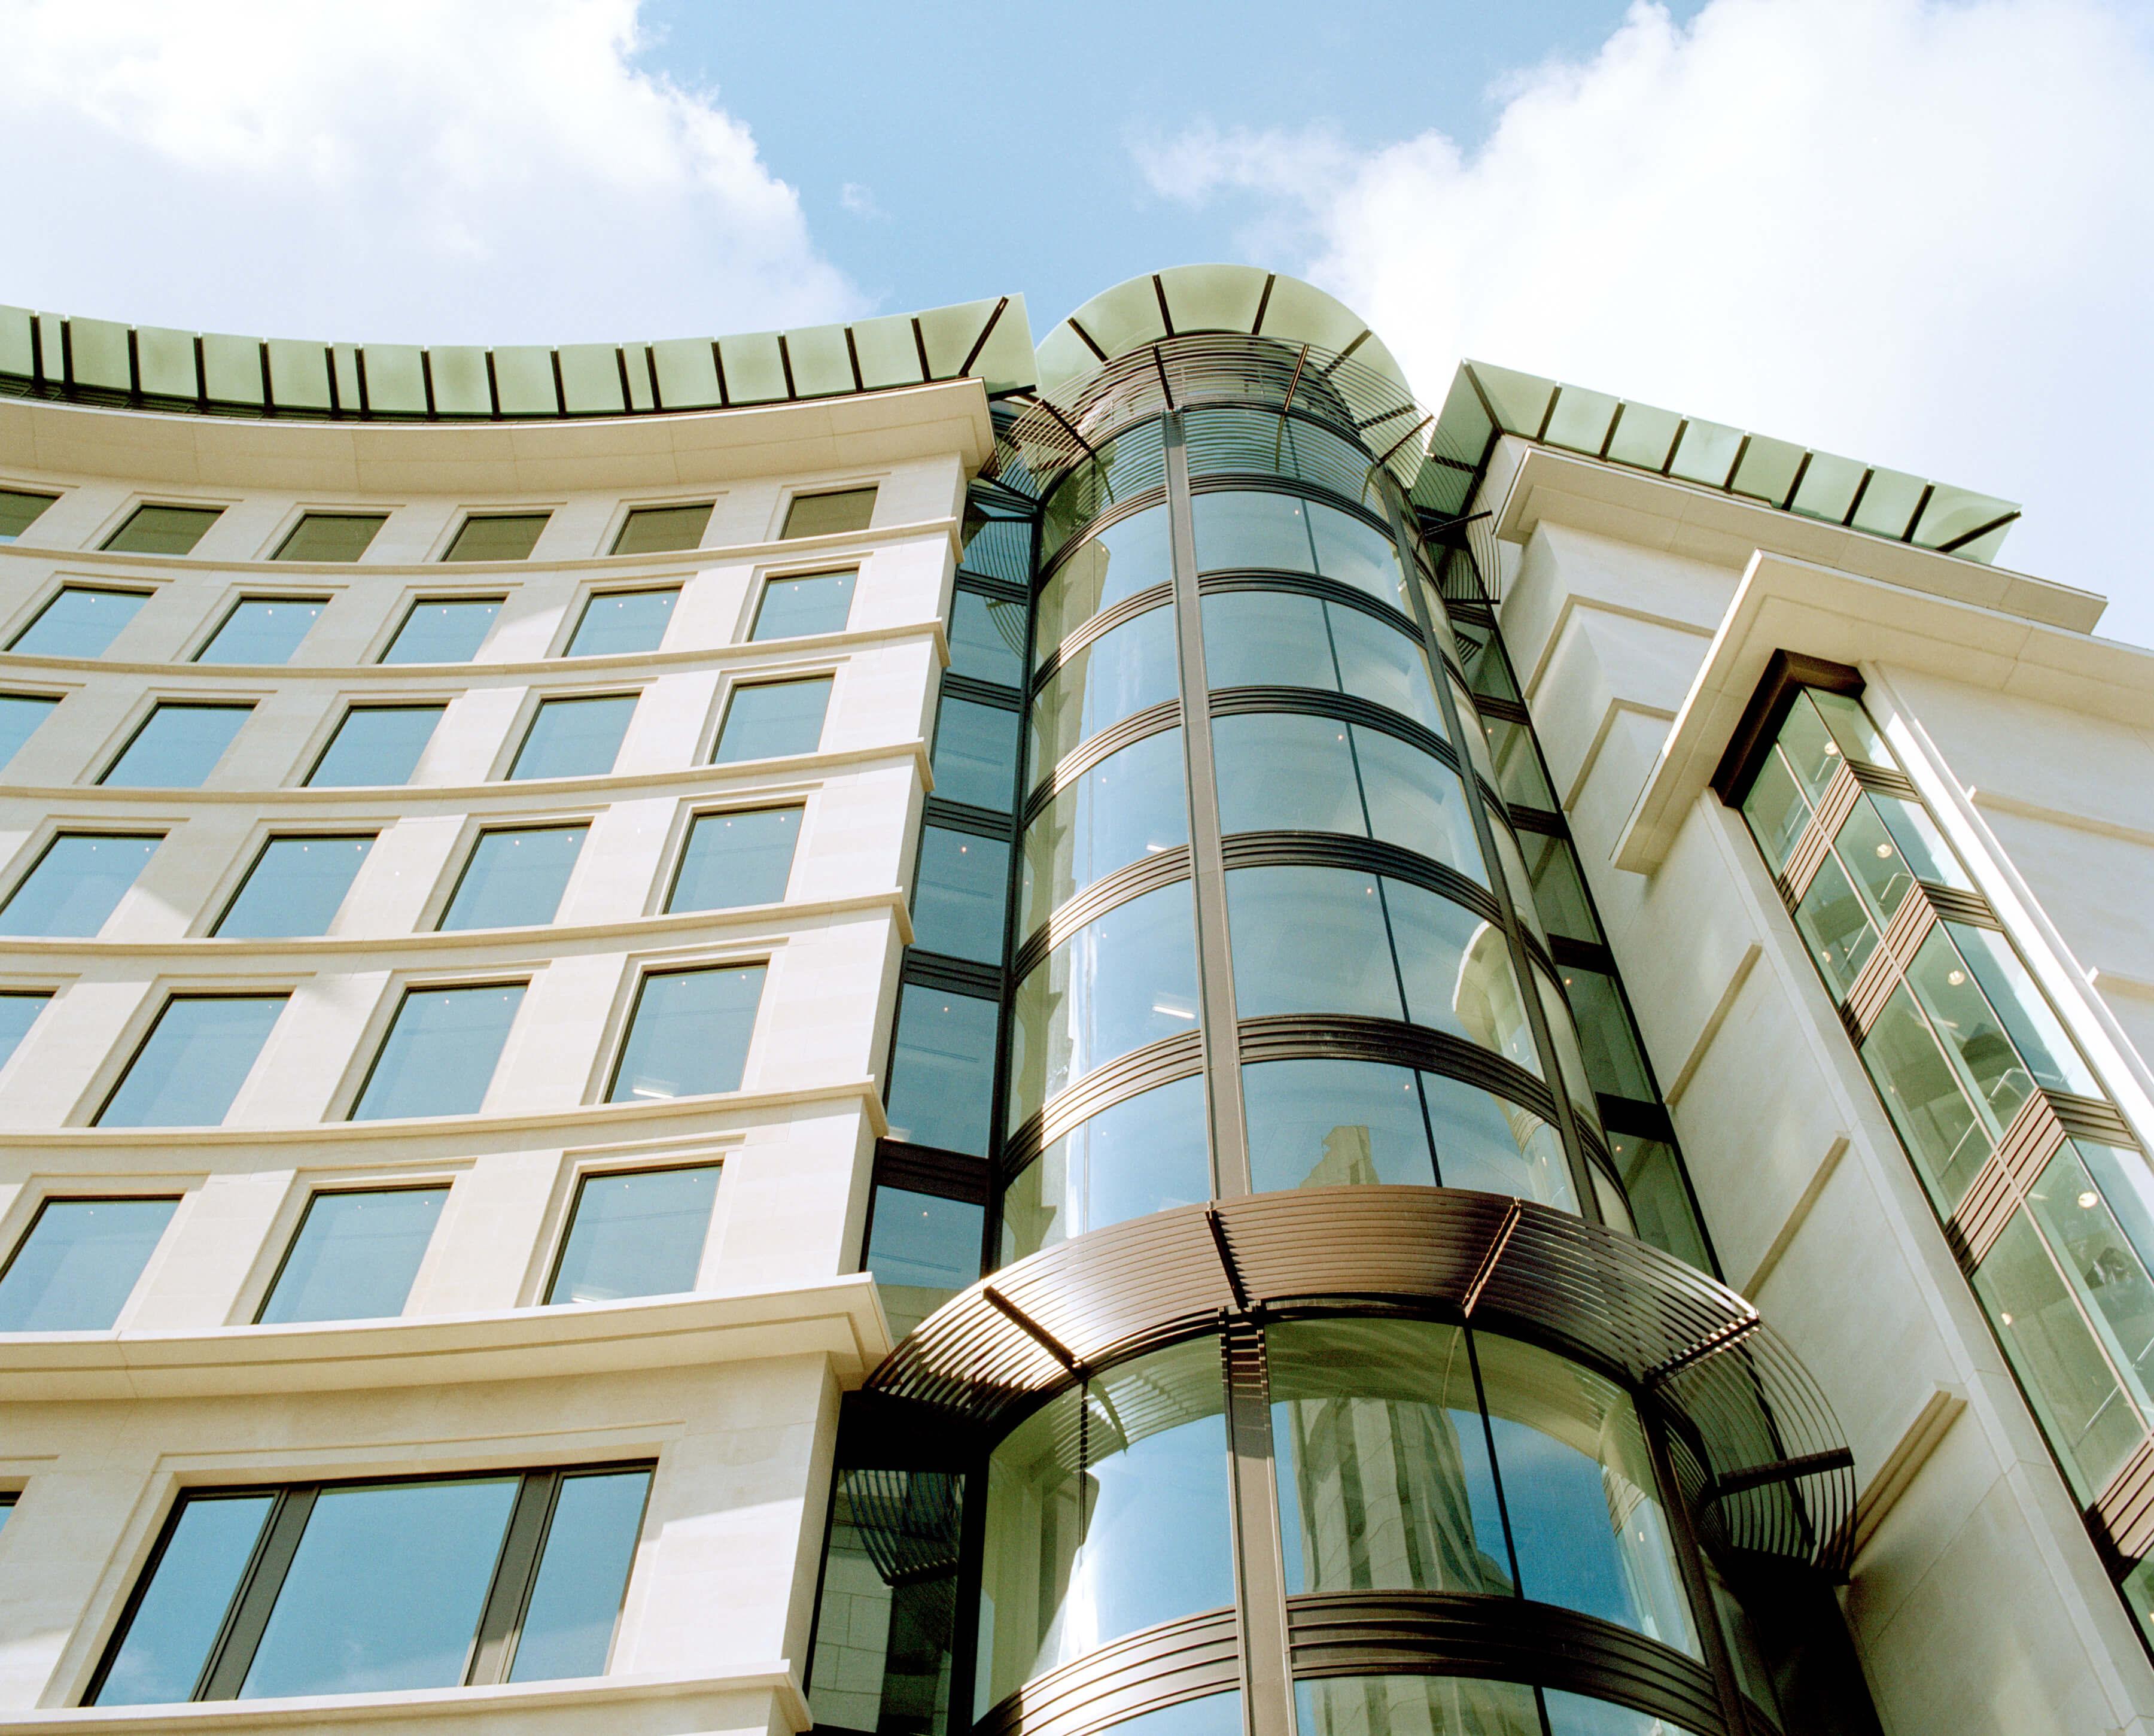 Prudential Plc, 12, Arthur Street, Fleet Street, London ...